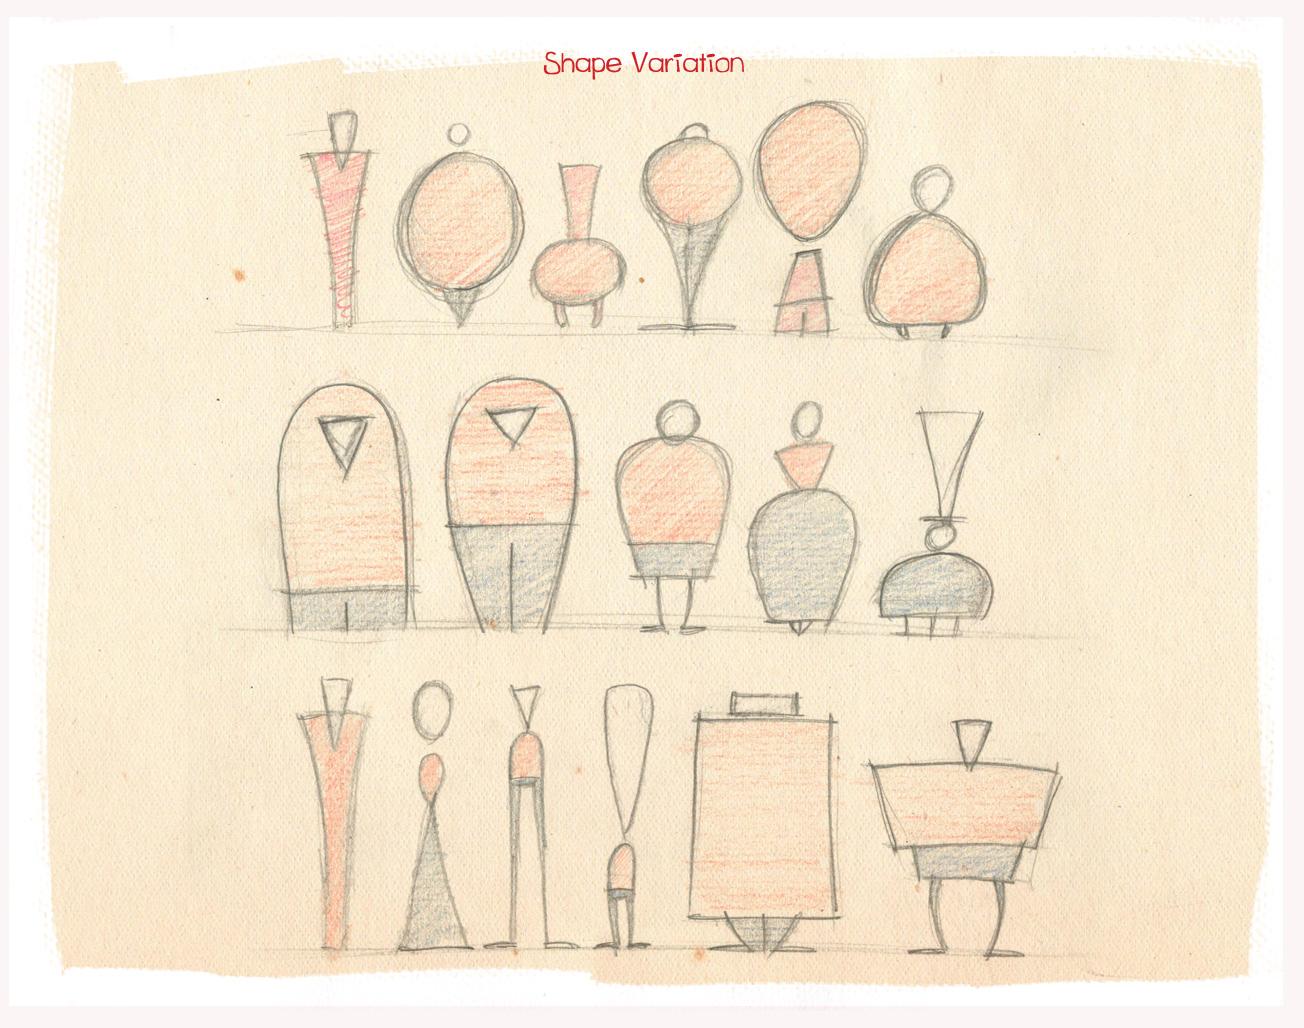 Character Design Using Basic Shapes : Echromiec shape variation